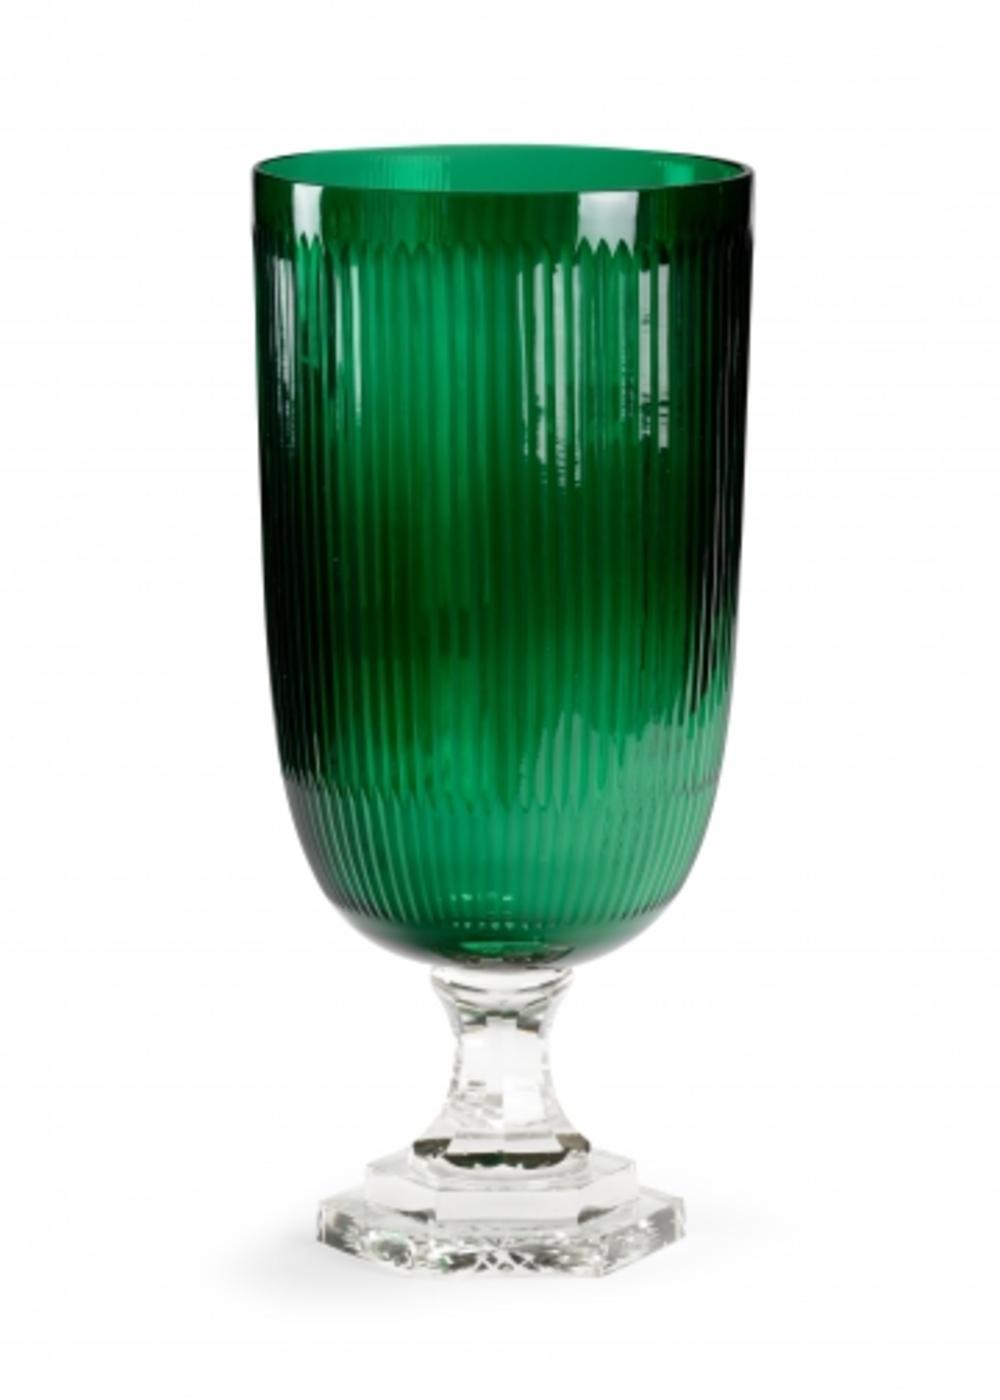 Wildwood Lamp - Cut Glass Hurricane, Emerald